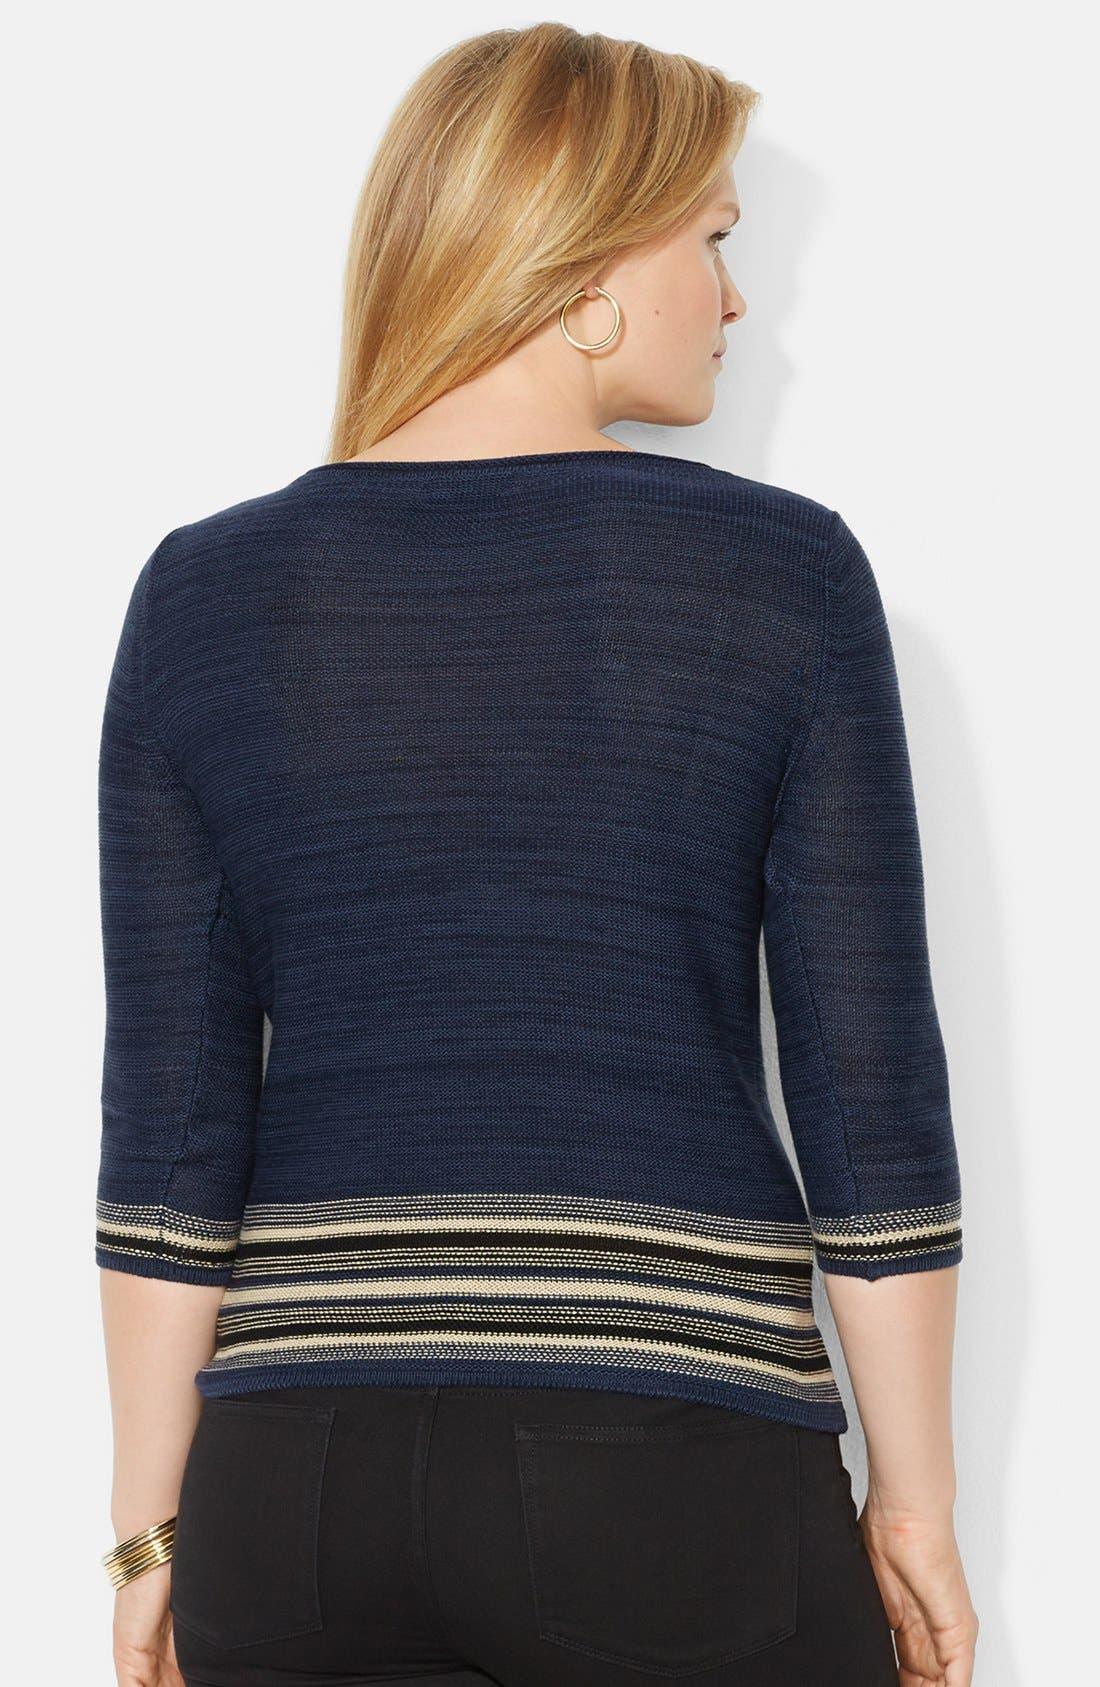 Alternate Image 2  - Lauren Ralph Lauren Ballet Neck Patterned Sweater (Plus Size)